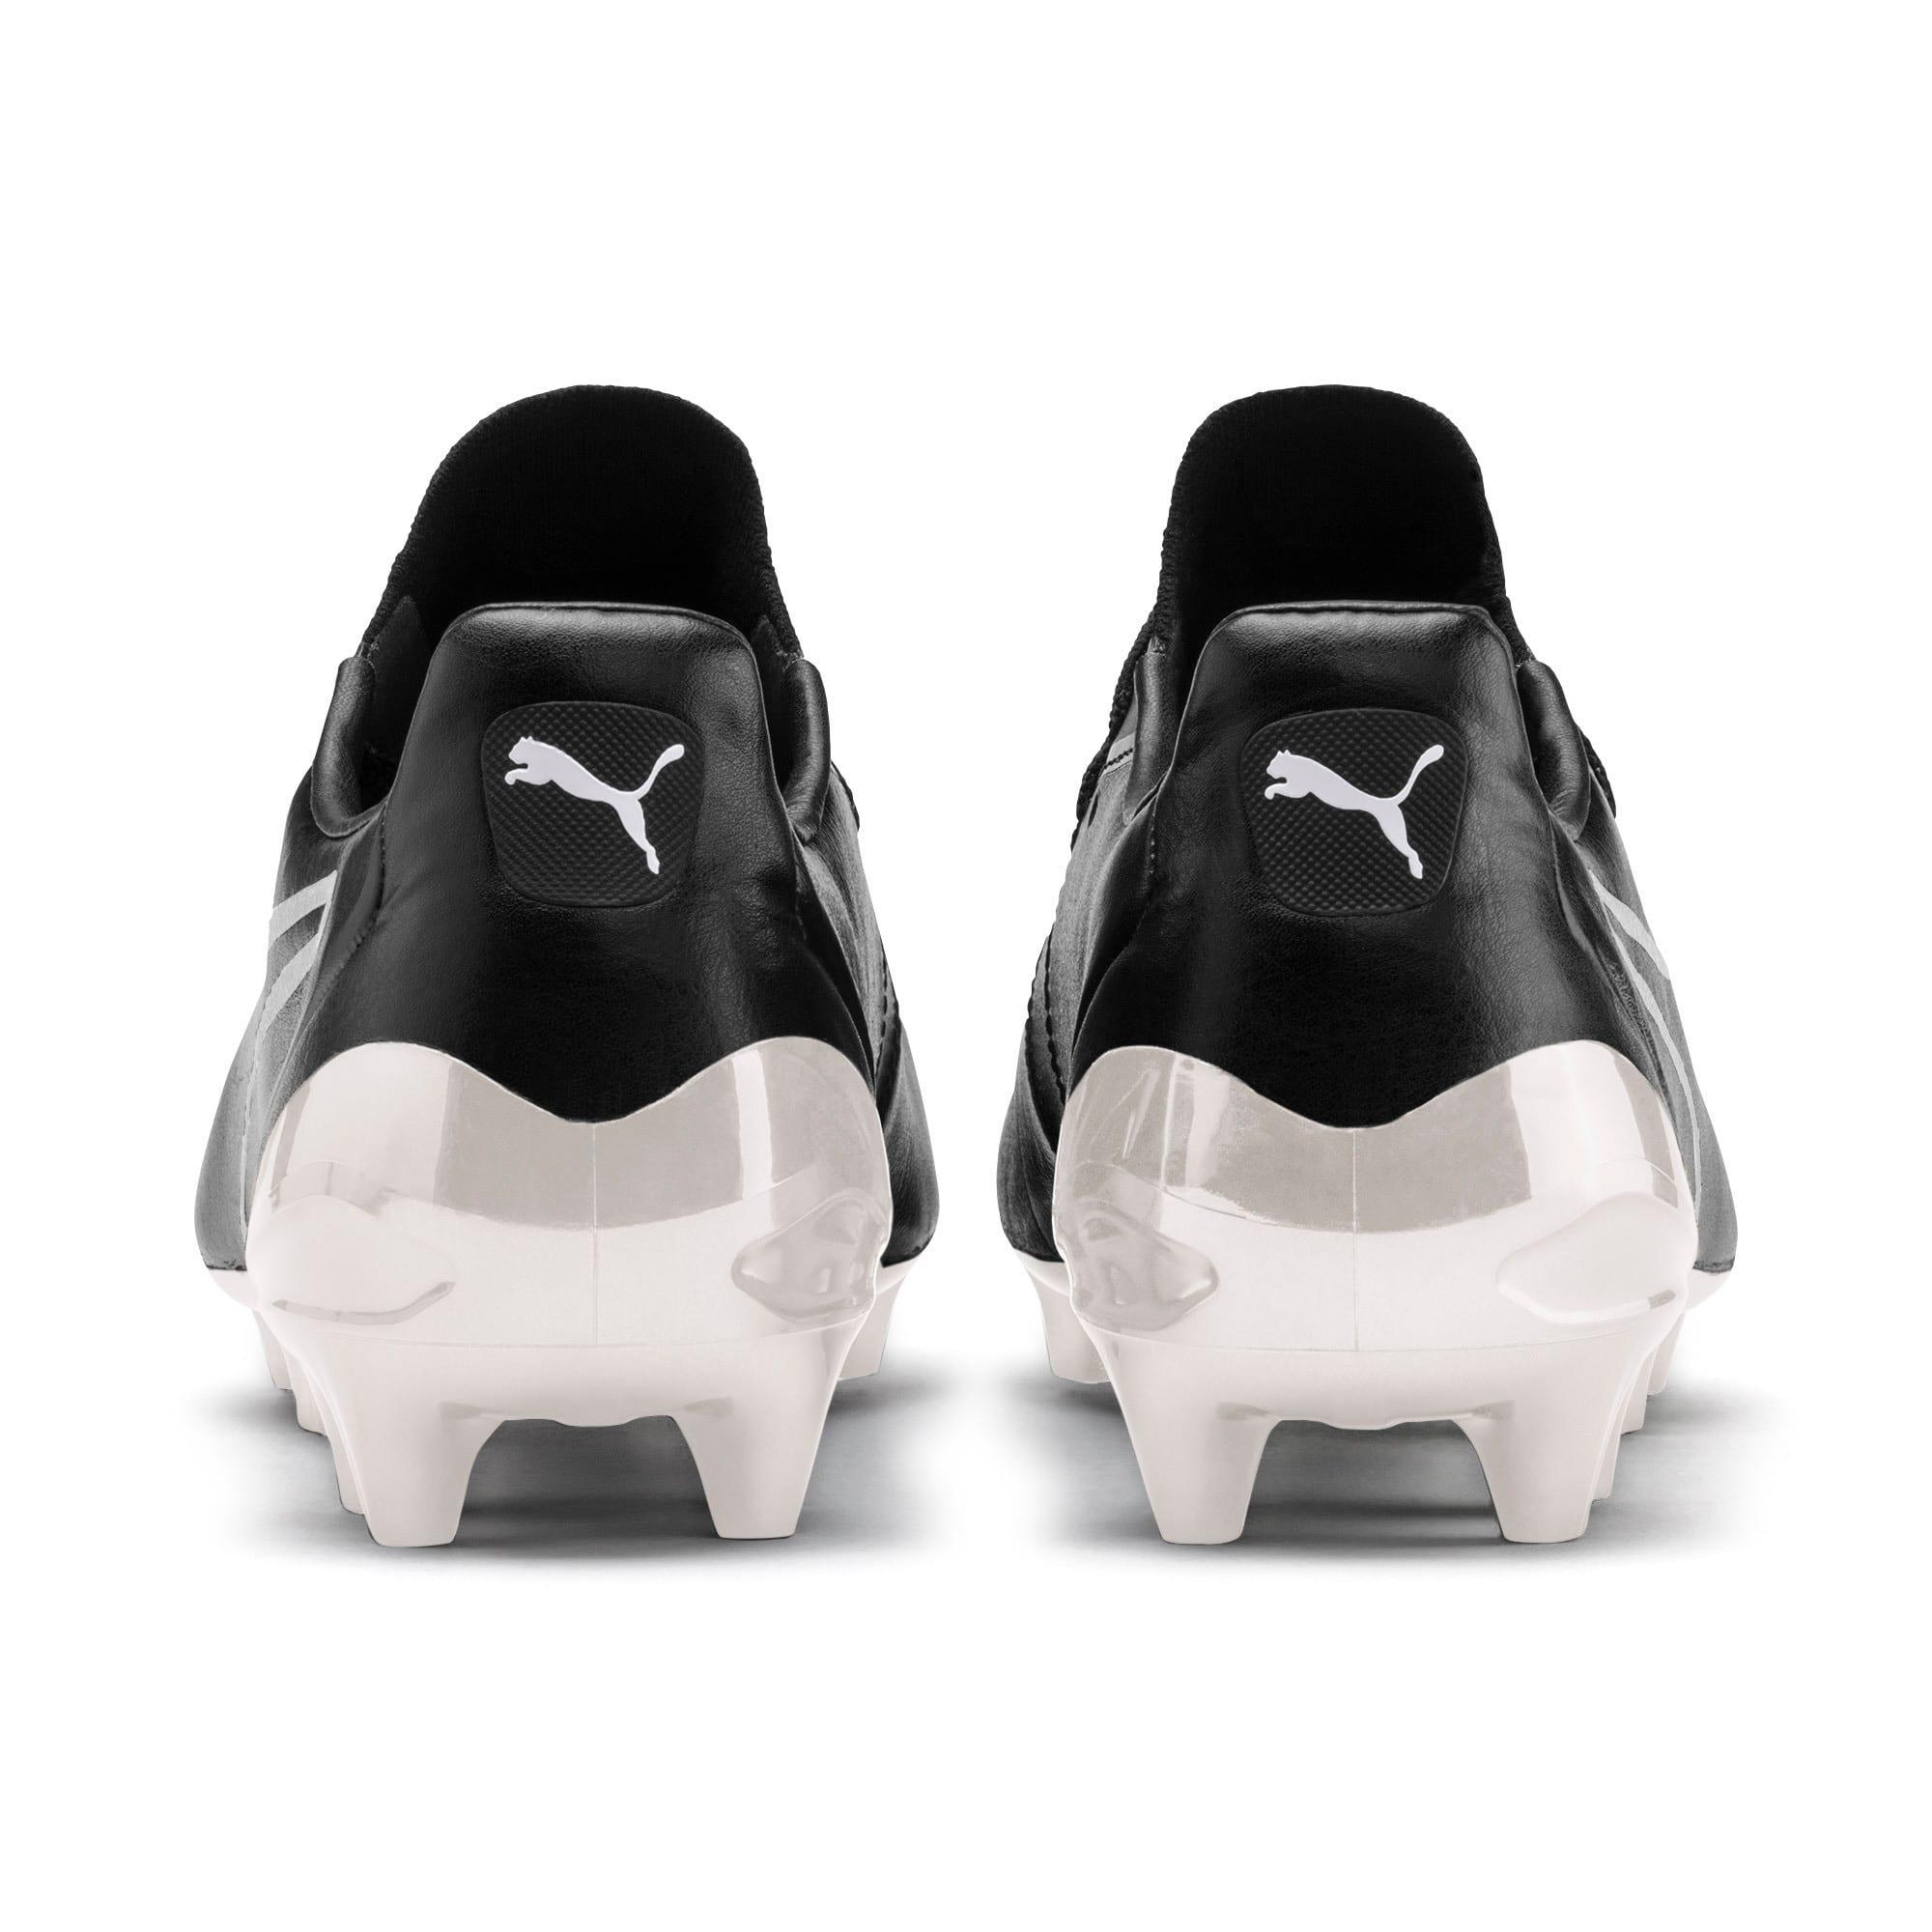 Thumbnail 3 of KING Platinum Lukaku Limited Edition Men's Football Boots, Puma Black-Puma White, medium